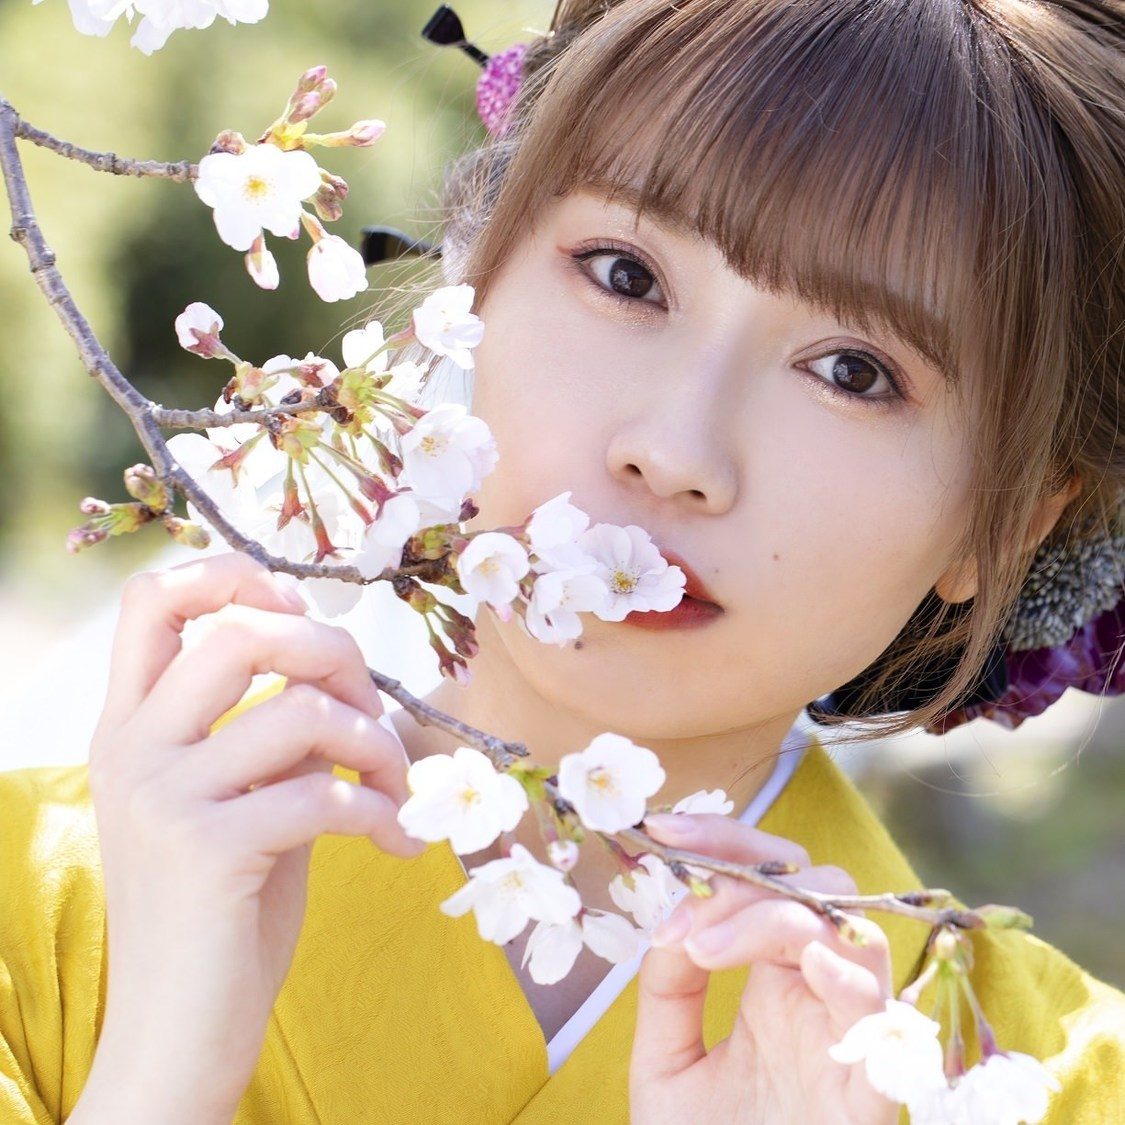 Singing Cosplayer Hikari、小田原城の桜とともに熱唱! 初音ミク「夢と葉桜」カバー動画公開